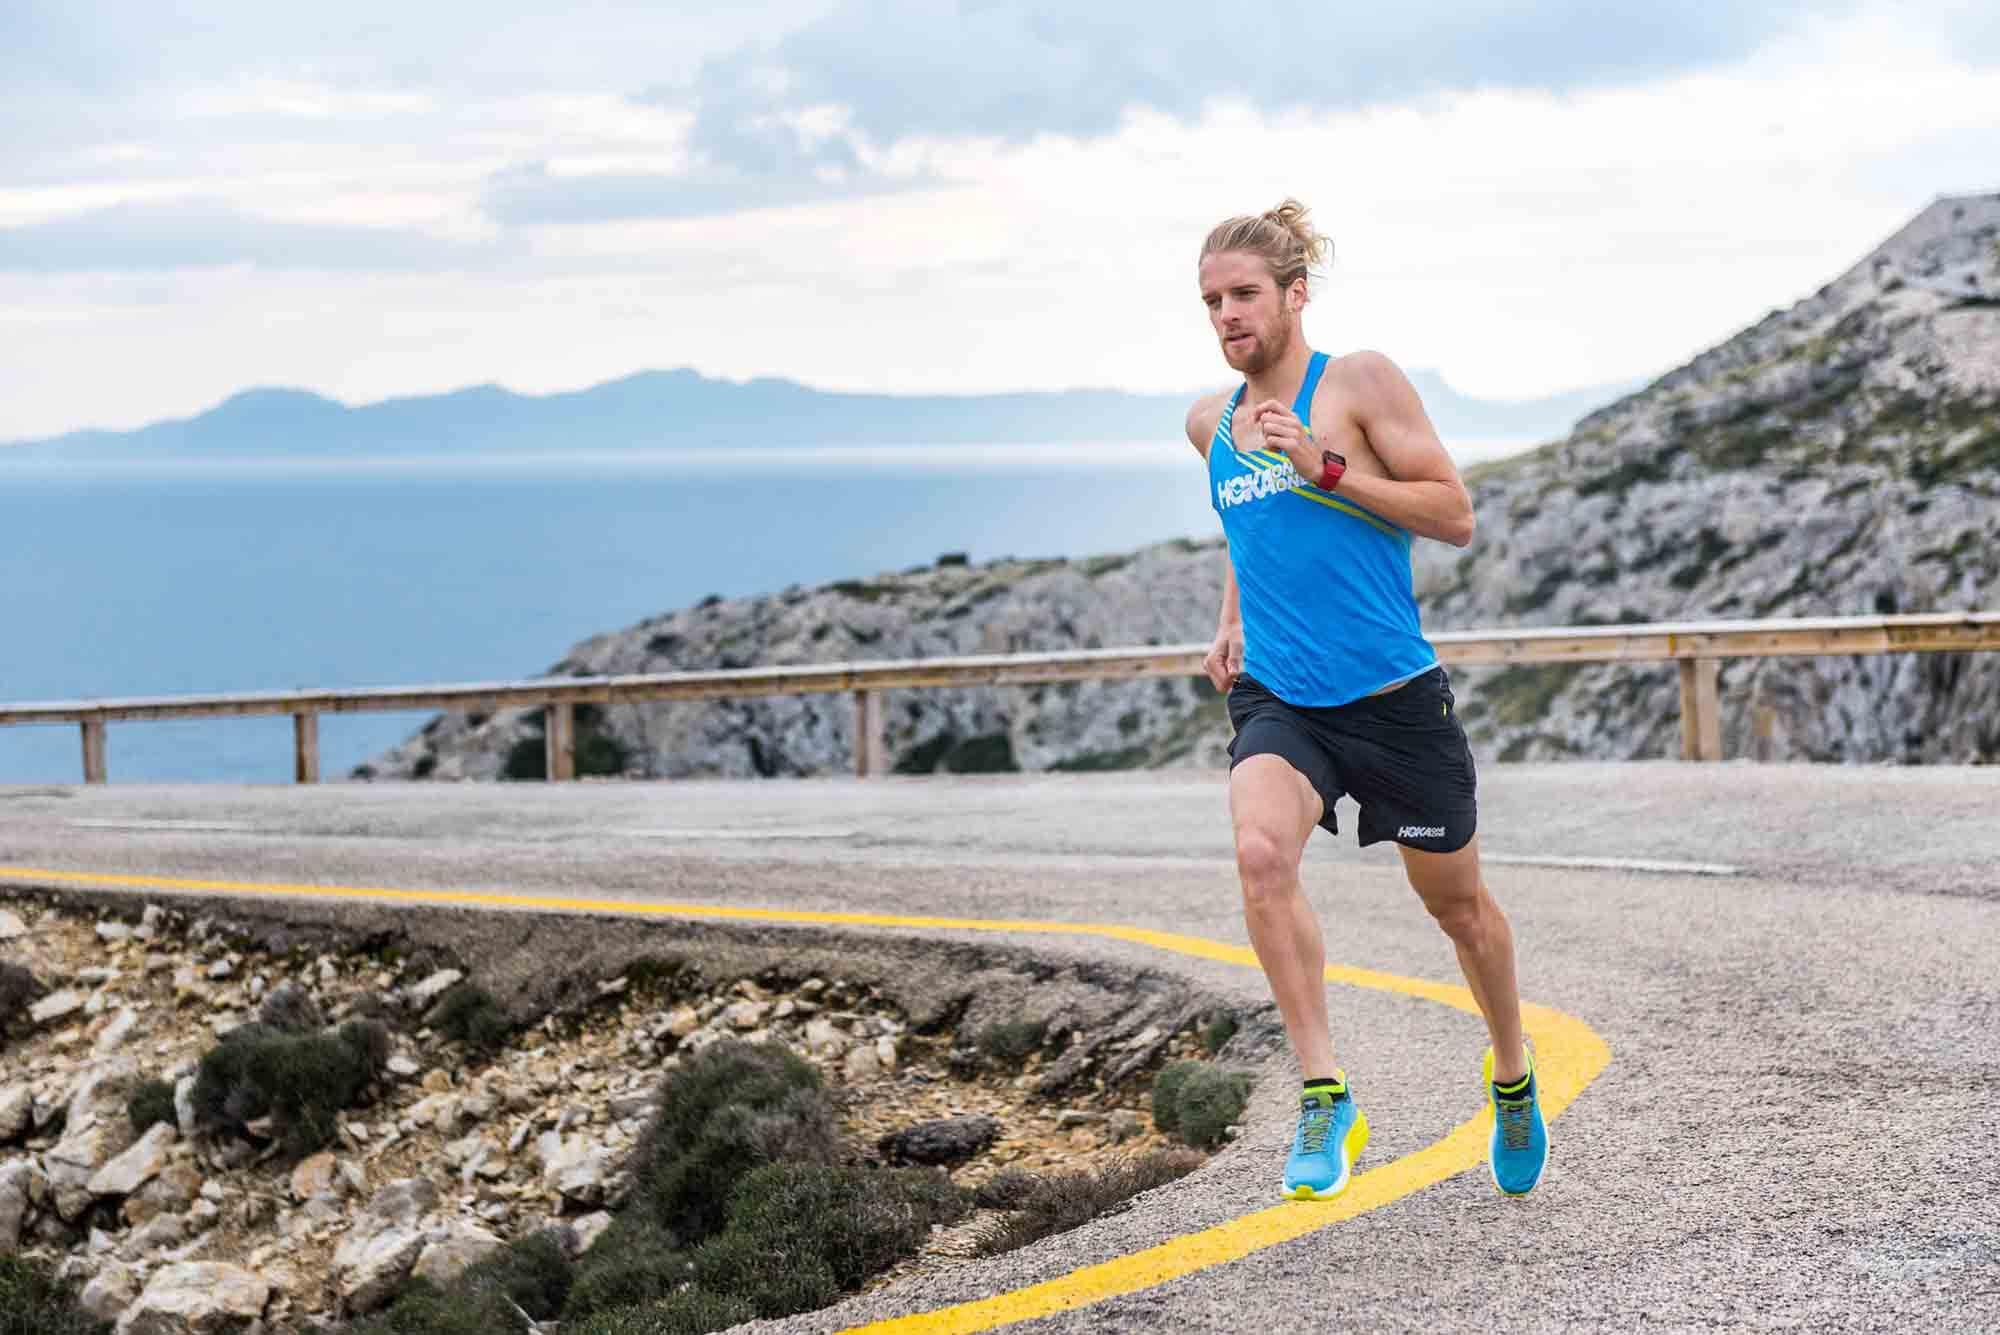 HOKA athlete Patrik Nilsson training in Mallorca